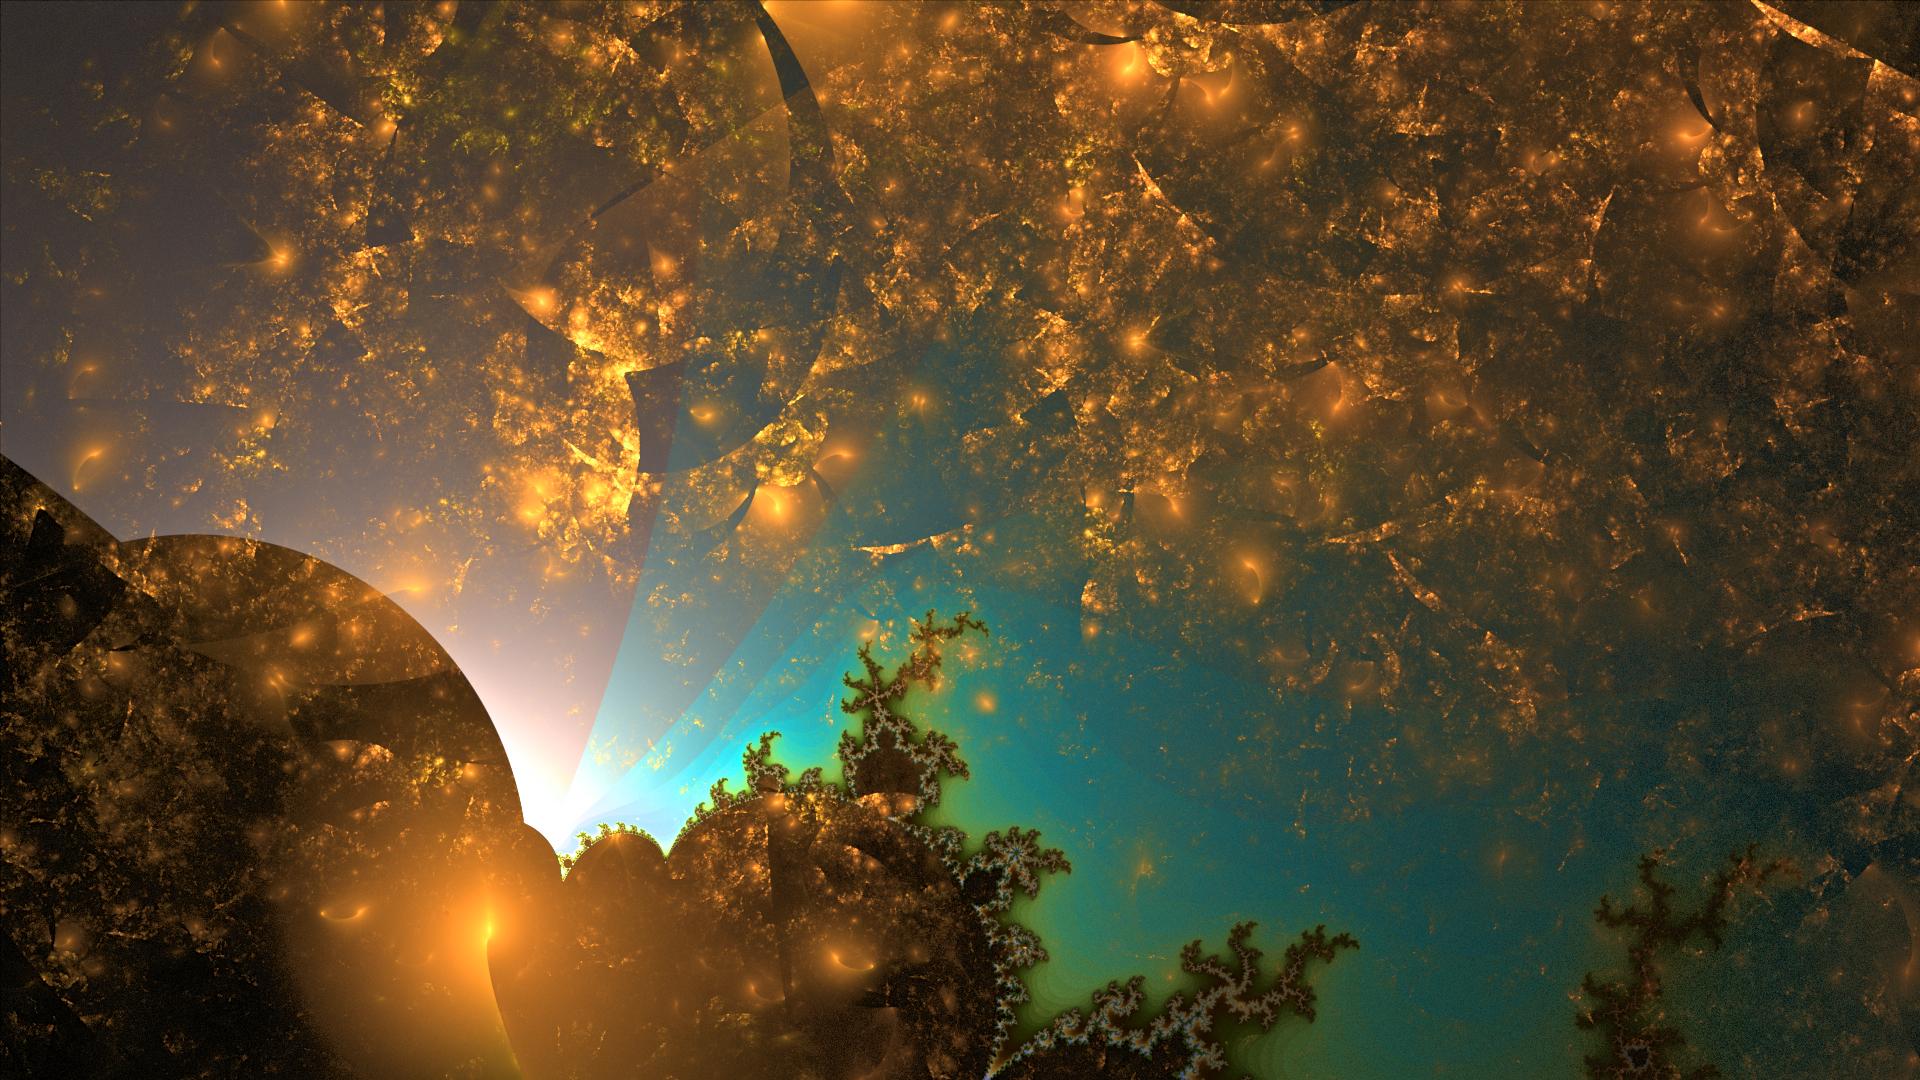 Daybreak by KateHodges